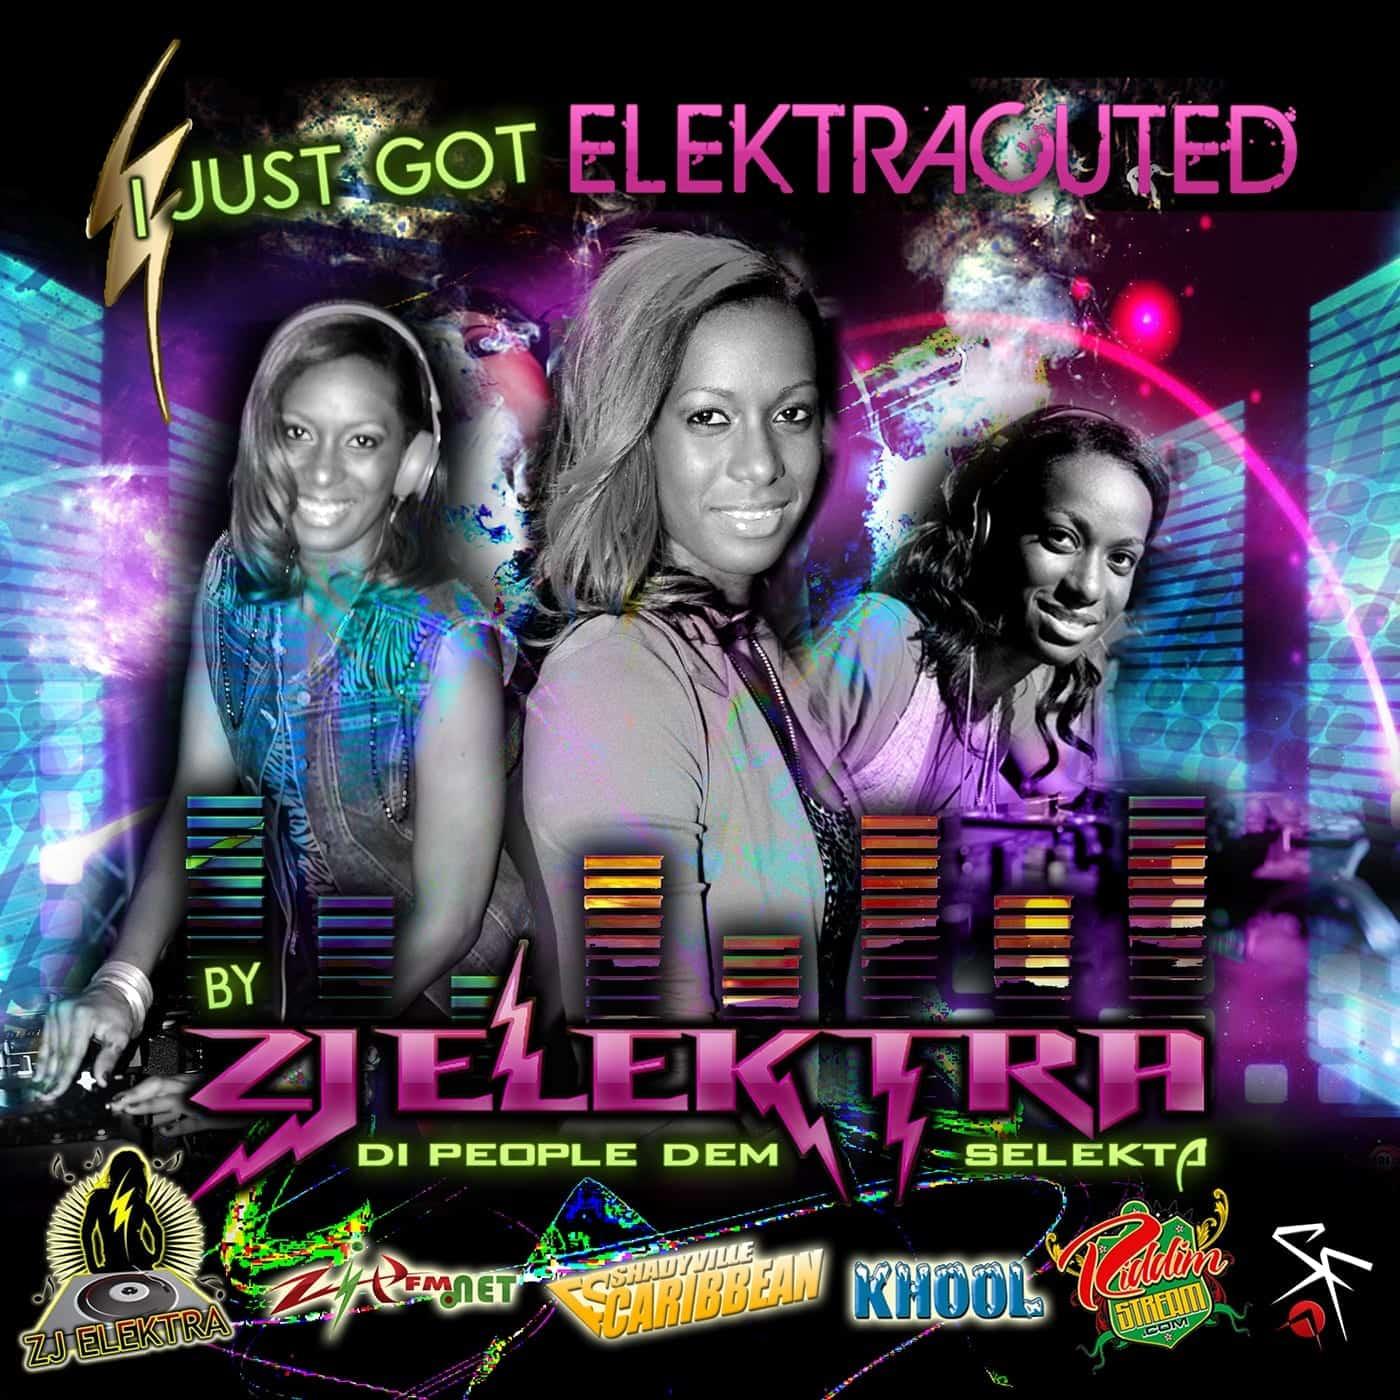 ZJ Elektra - I Just Got Elektracuted